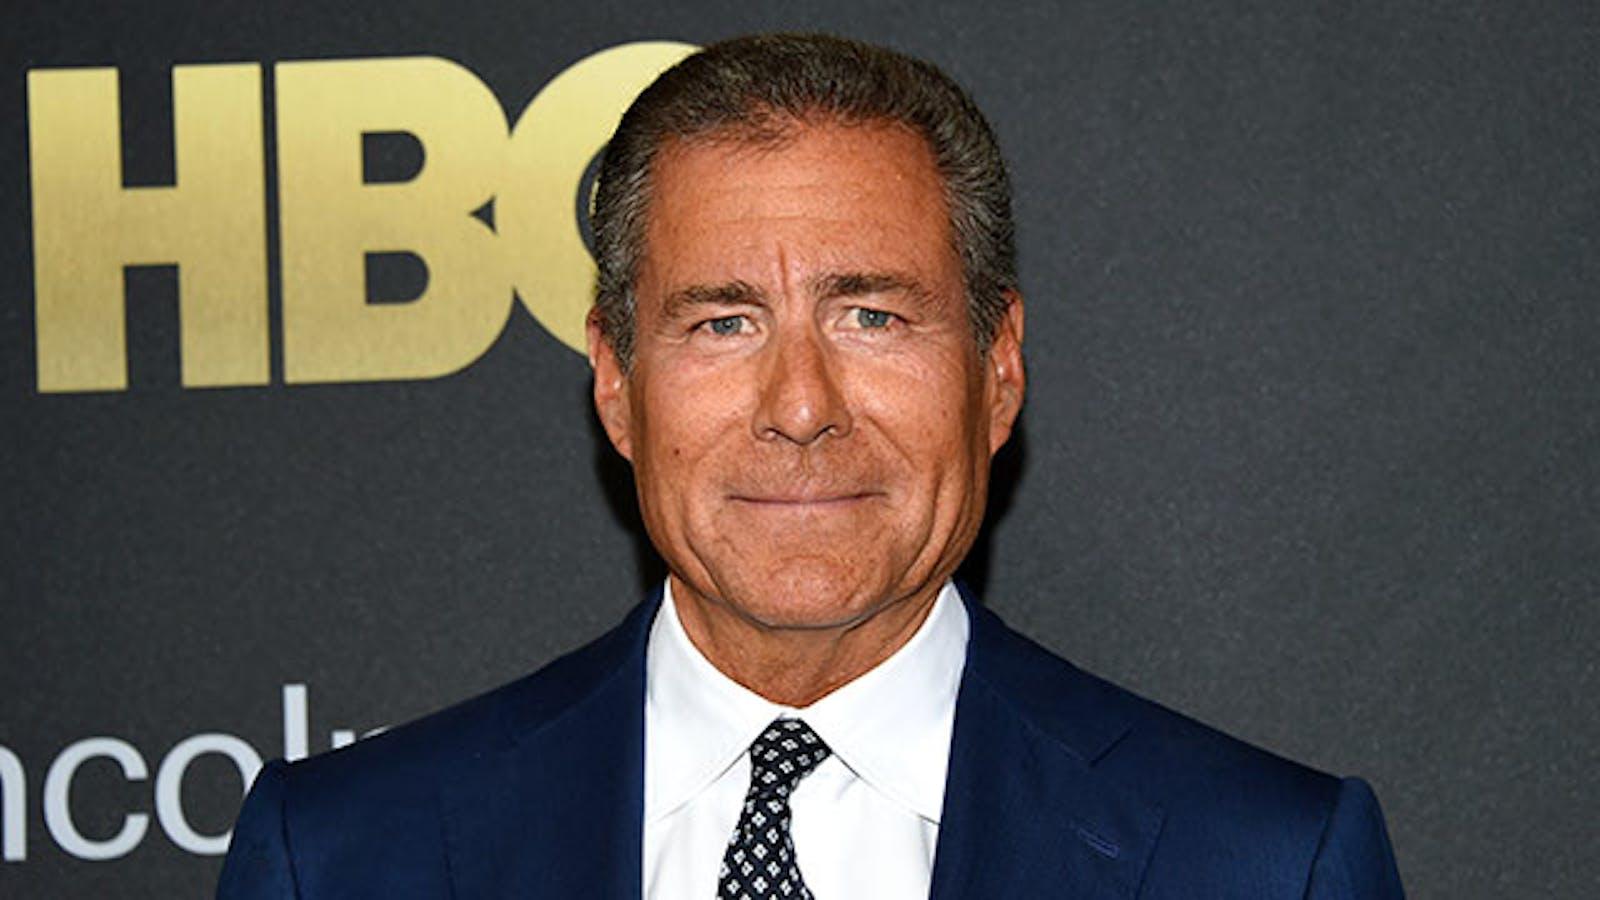 HBO CEO Richard Plepler. Photo: AP